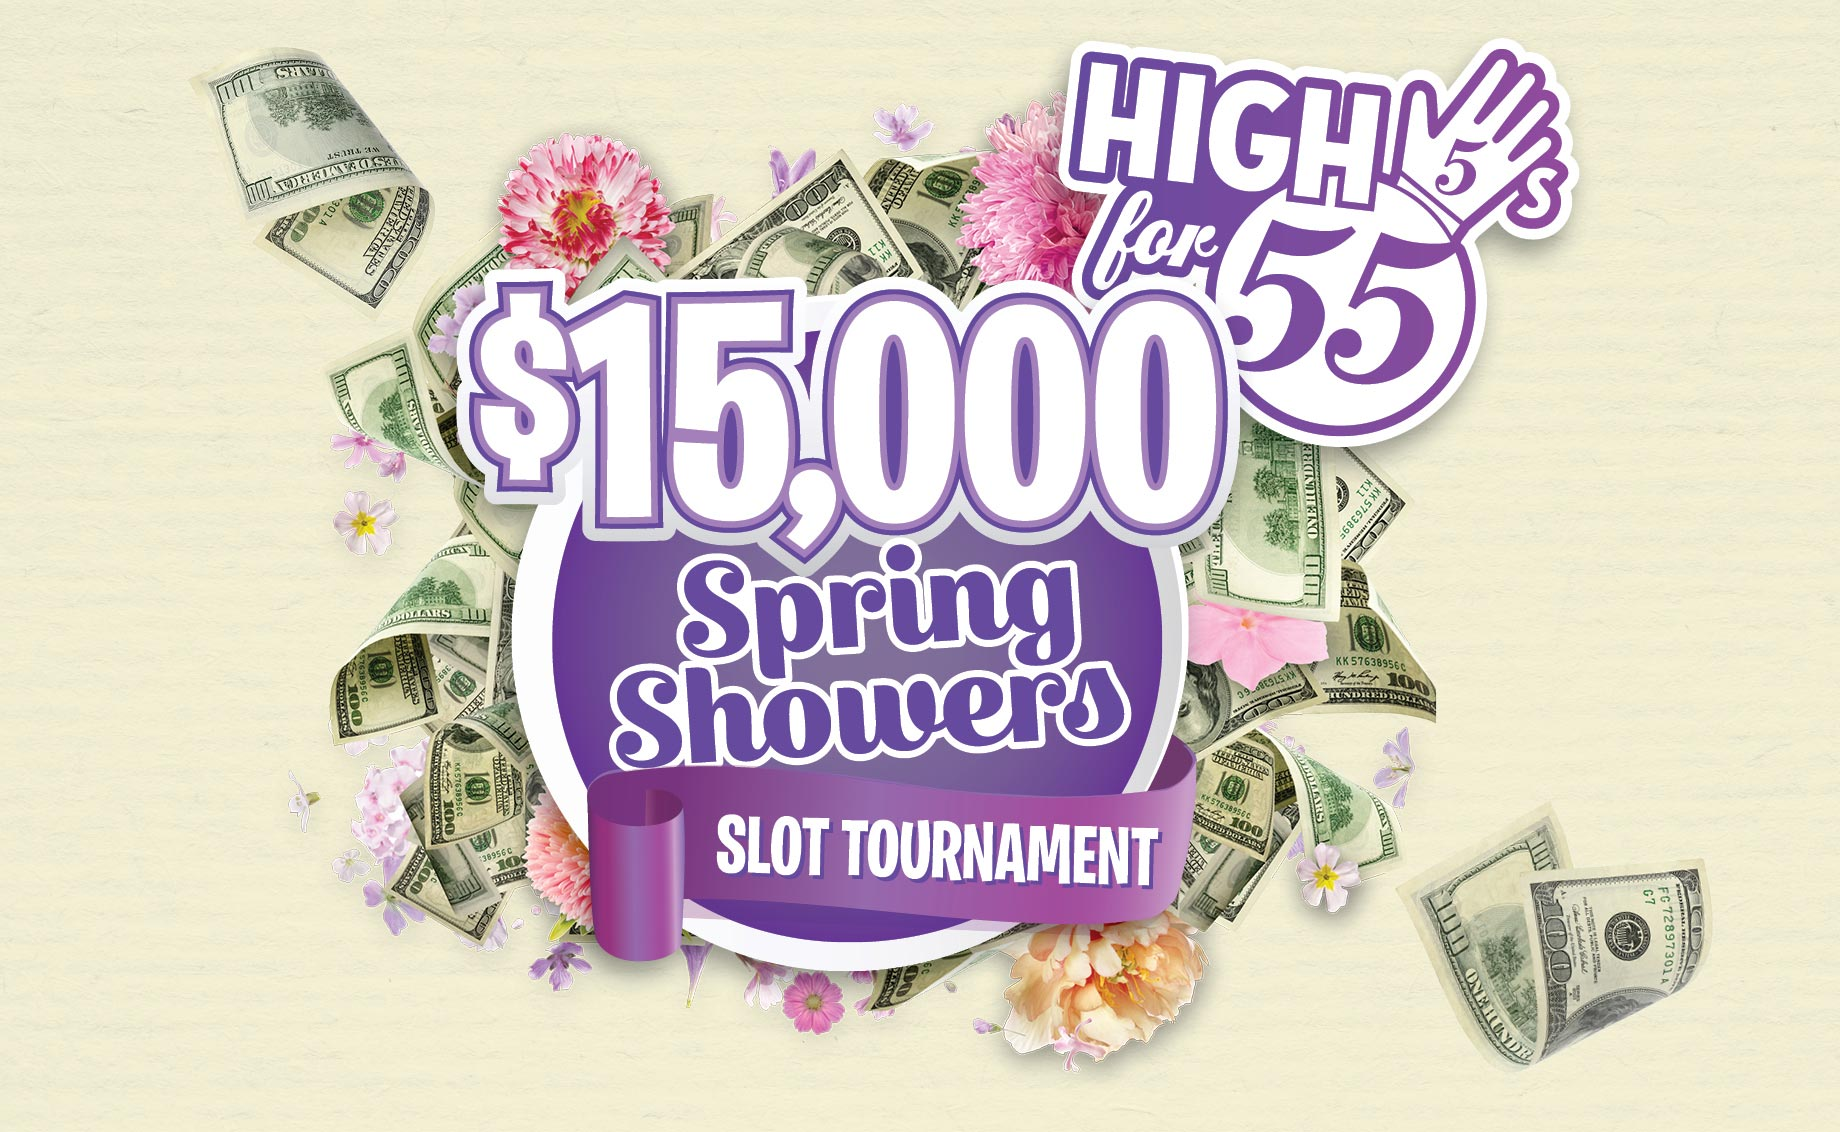 $15,000 Spring Showers Slot Tournament